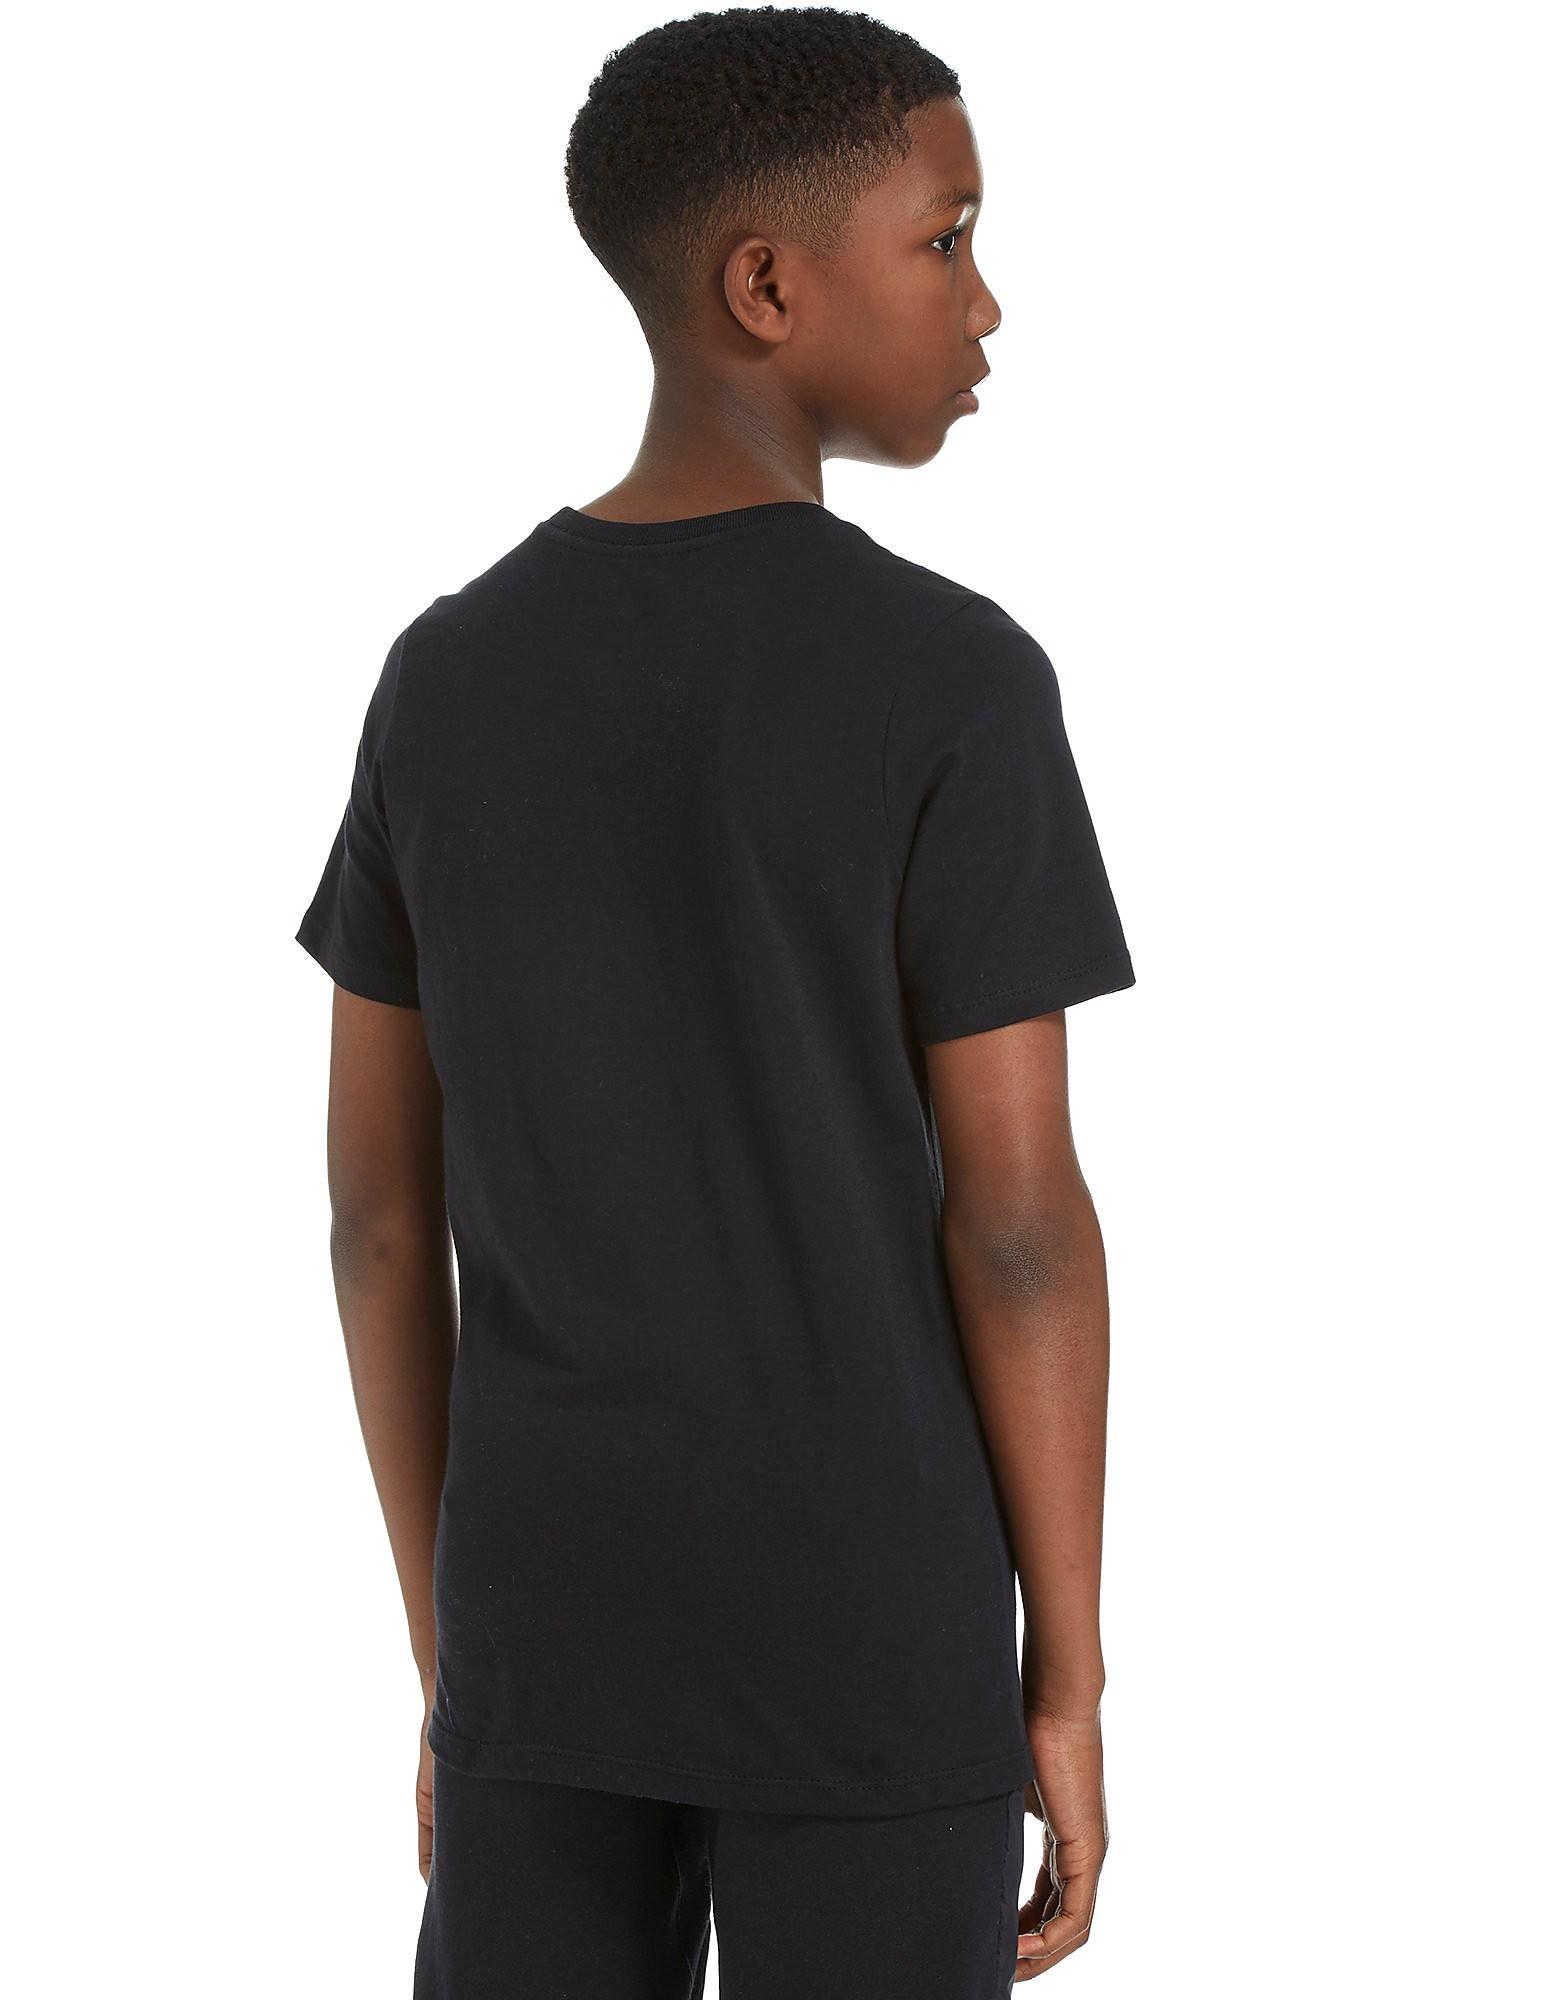 Nike Split Futura T-Shirt Junior